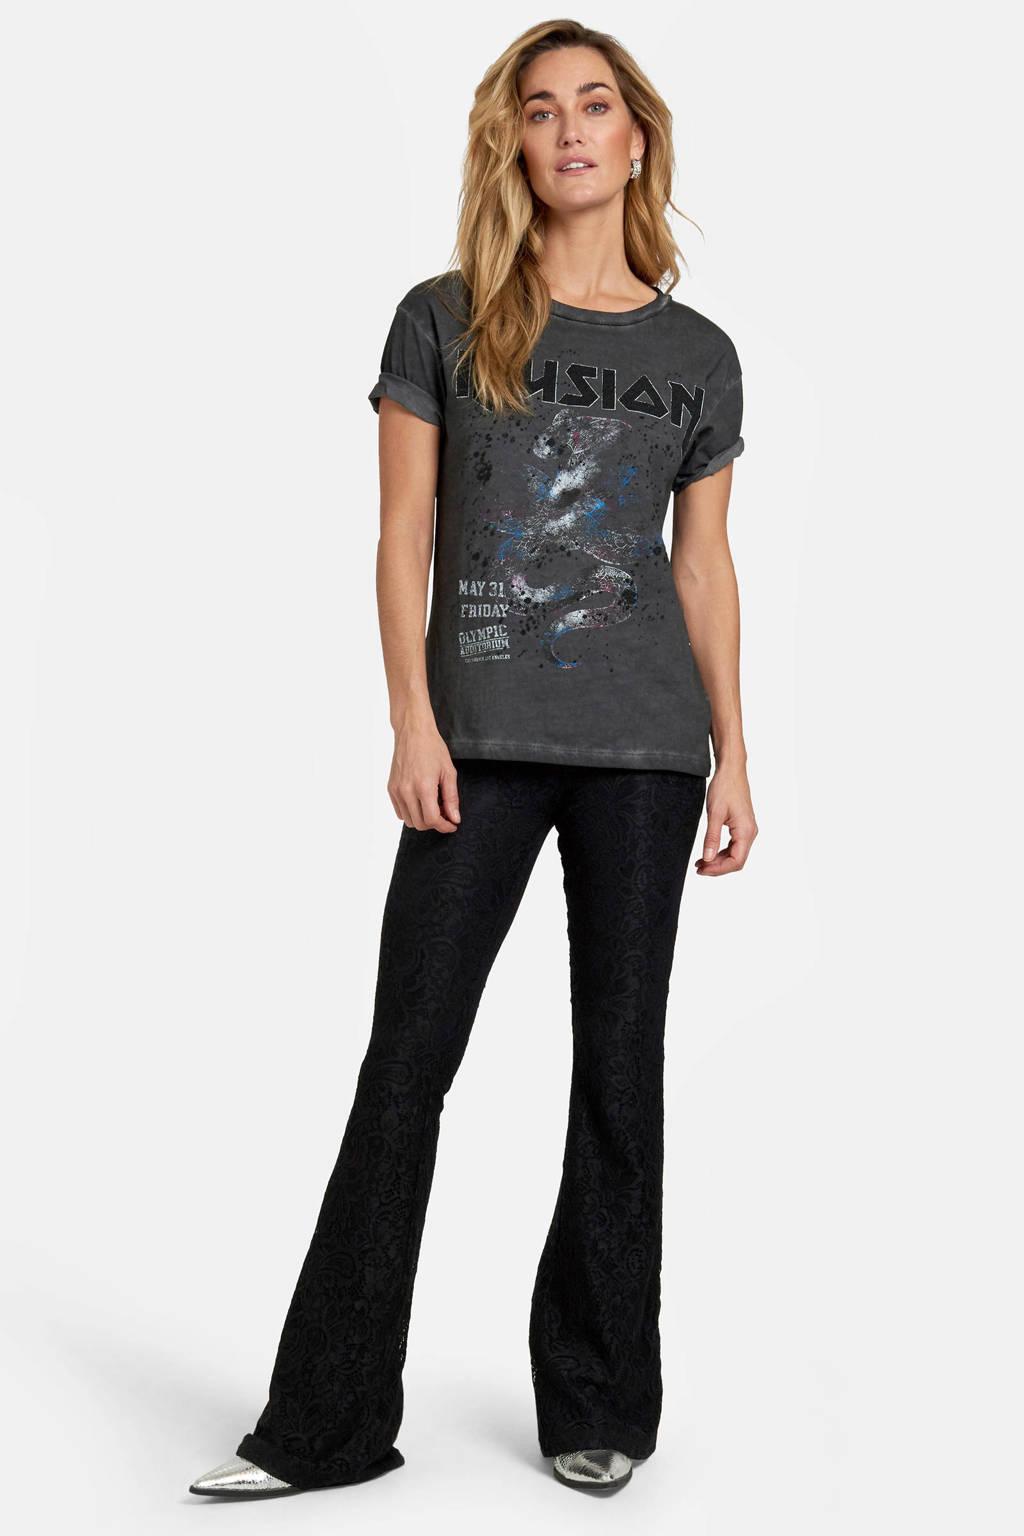 Eksept by Shoeby high waist skinny broek Lotty Lace met all over print zwart, Zwart